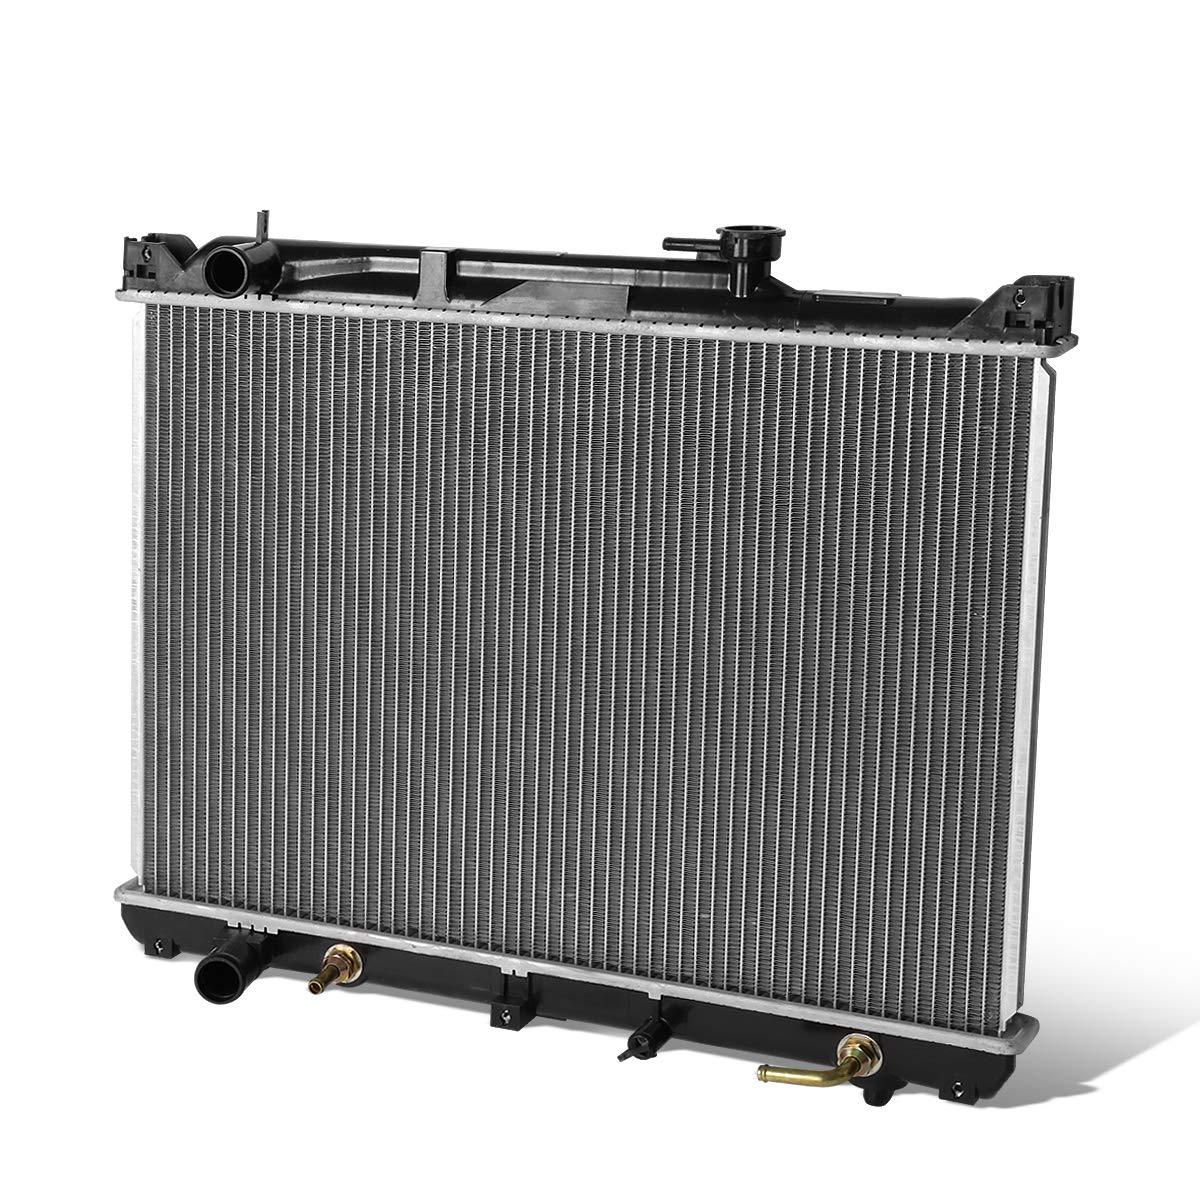 DPI 2430 OE Style Aluminum Core High Flow Radiator For 01-05 Suzuki Grand Vitara//XL7 AT//MT